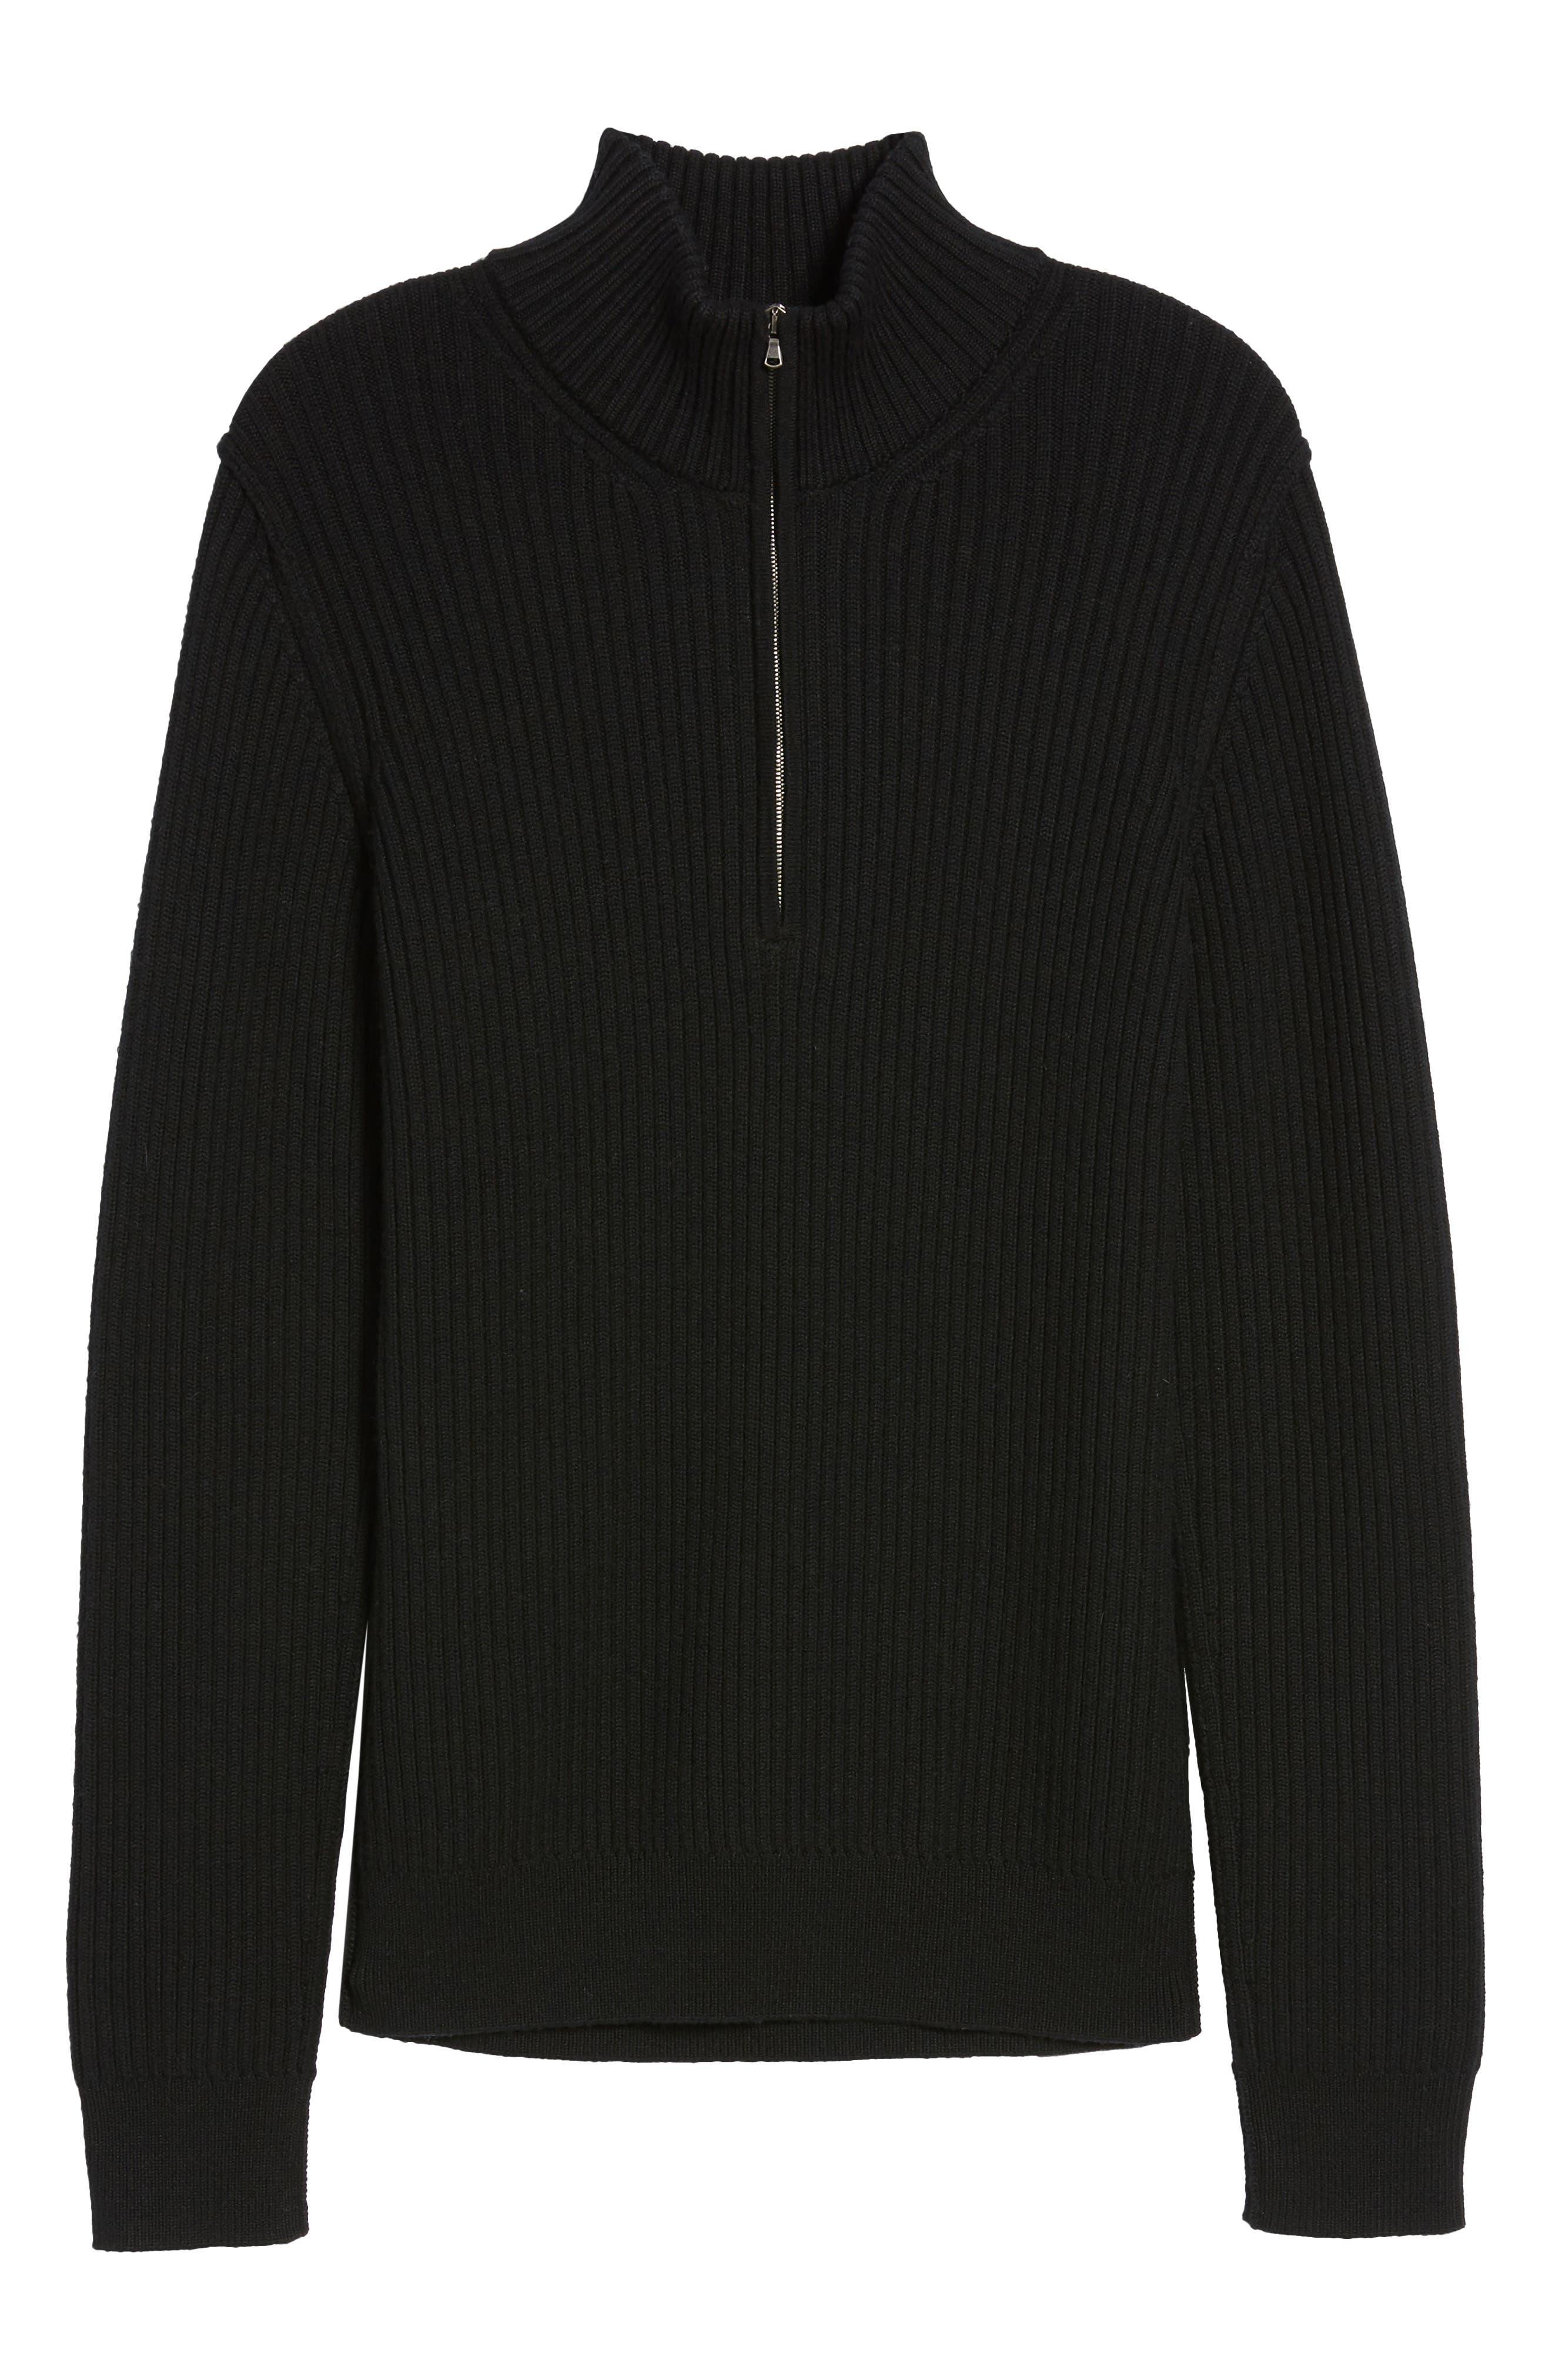 Ribbed Quarter Zip Mock Neck Sweater,                             Alternate thumbnail 6, color,                             001